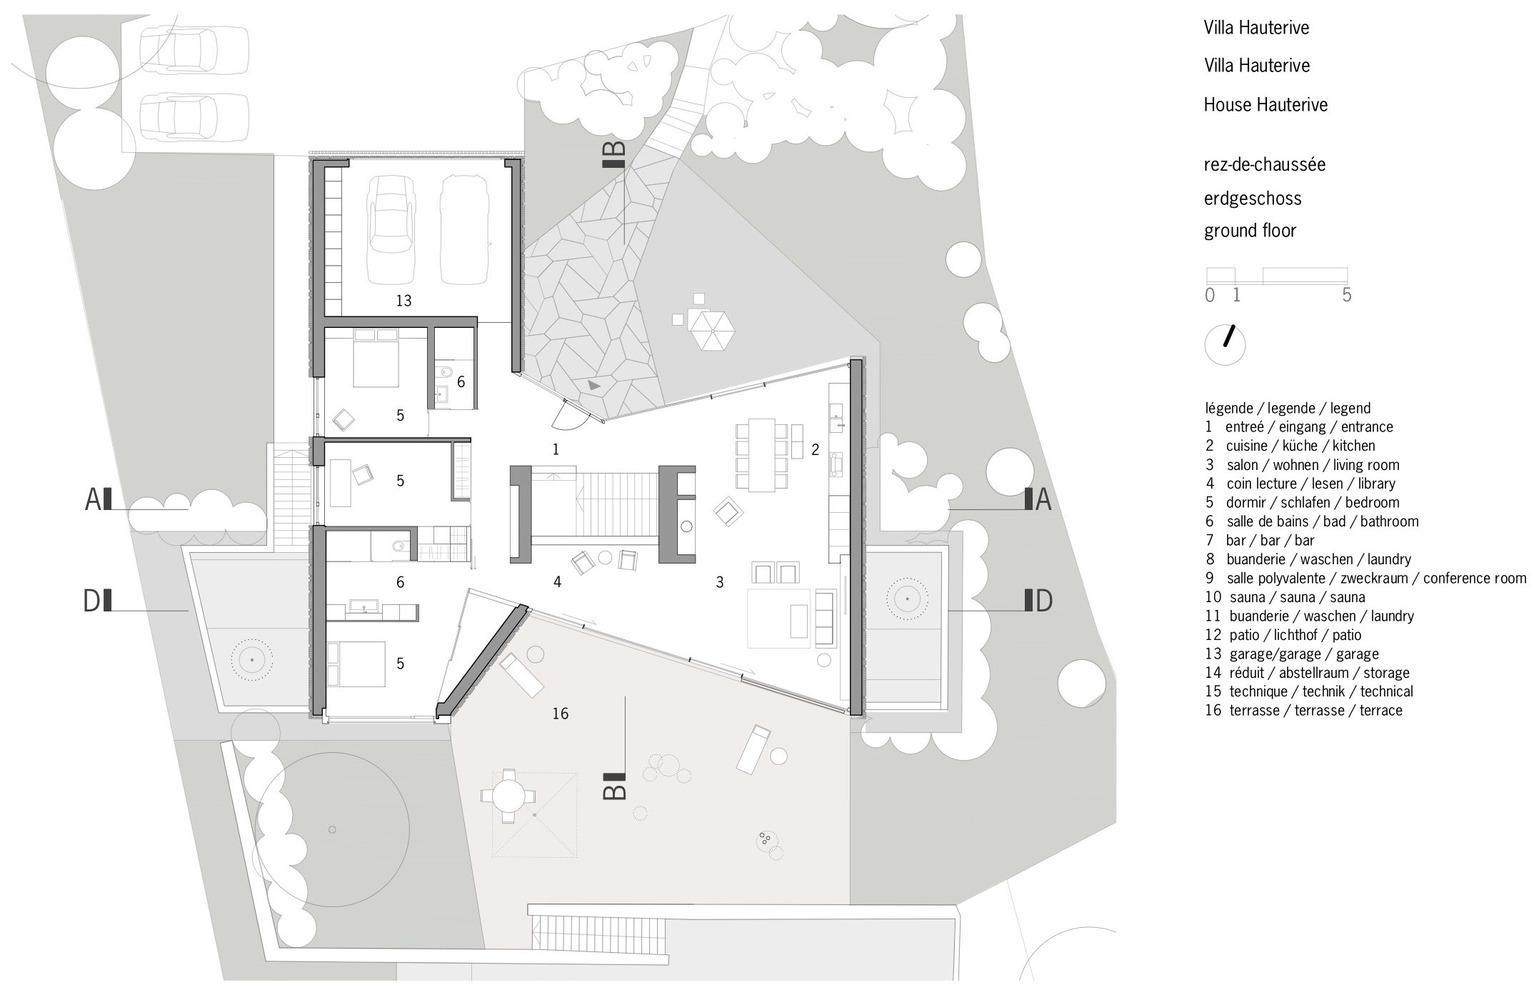 Exceptional House In Hauterive,Ground Floor Plan